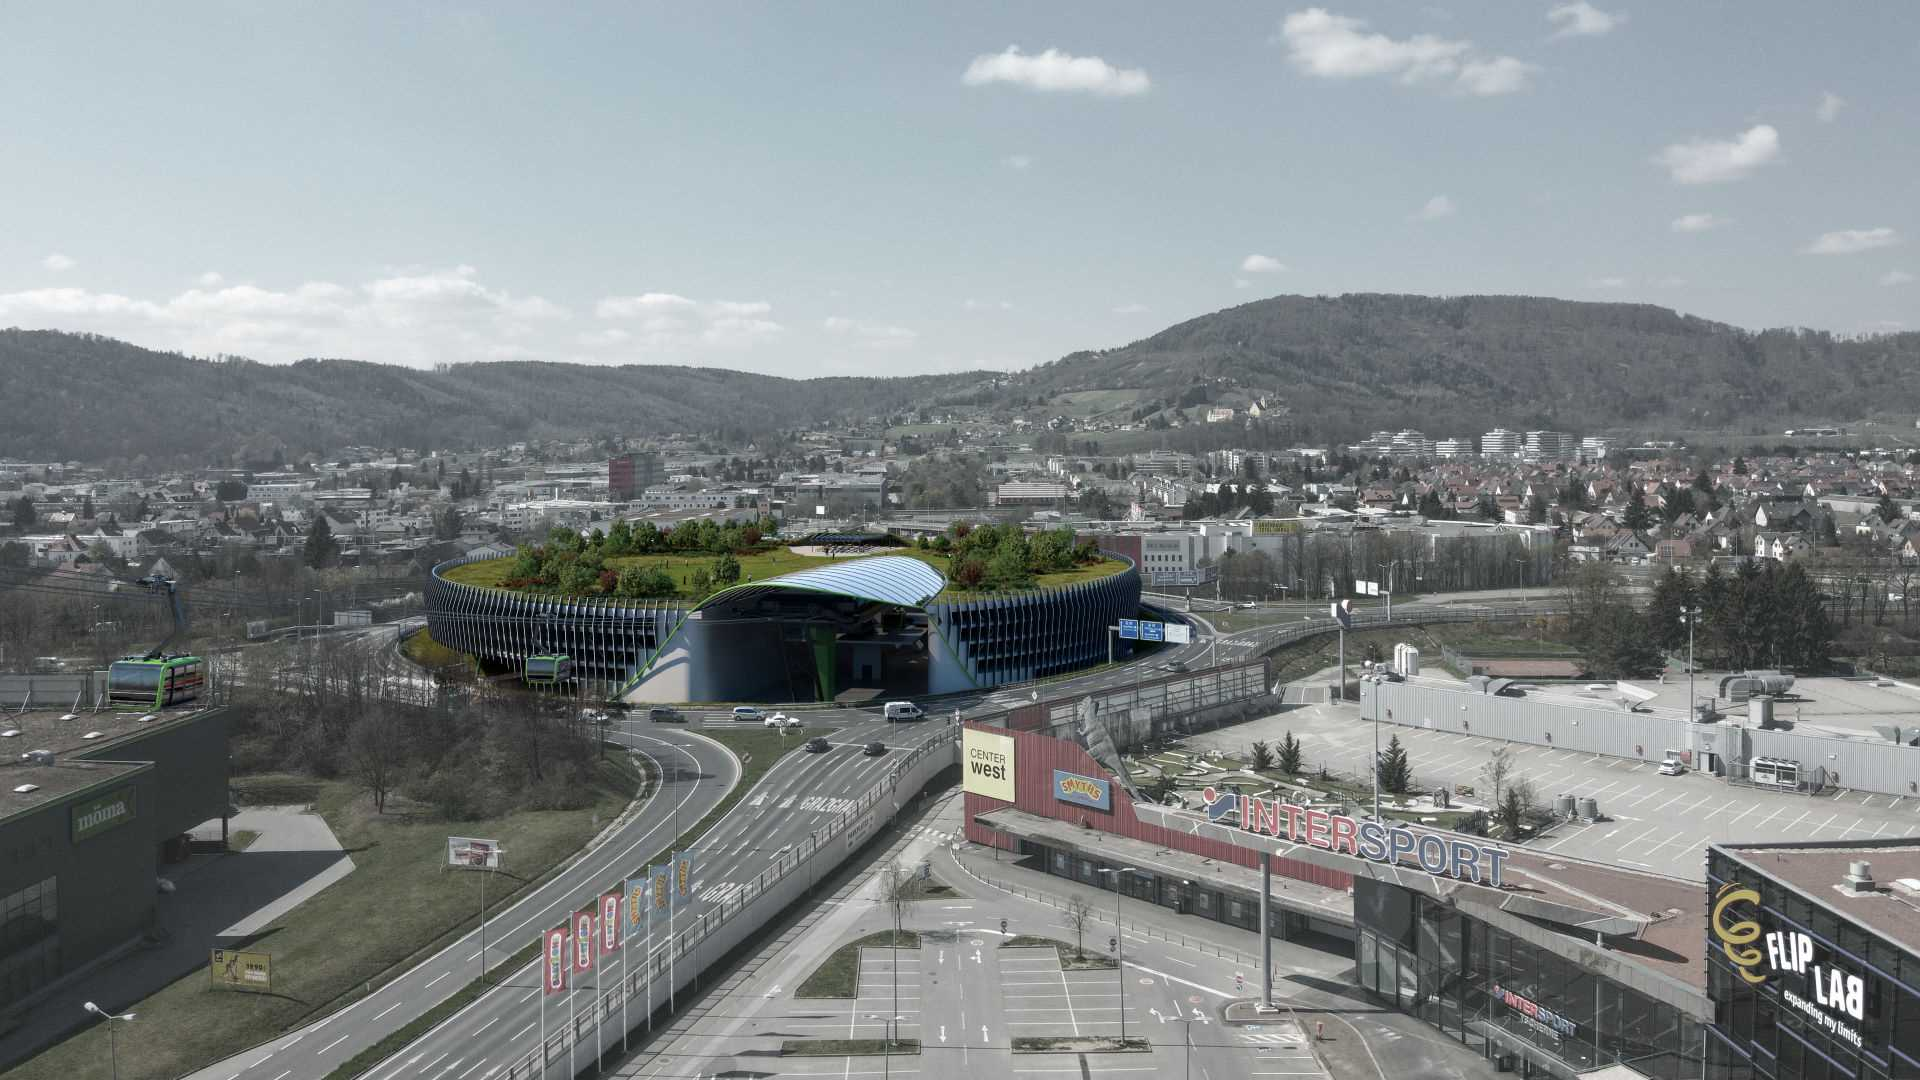 Graz-Webling Cable Car